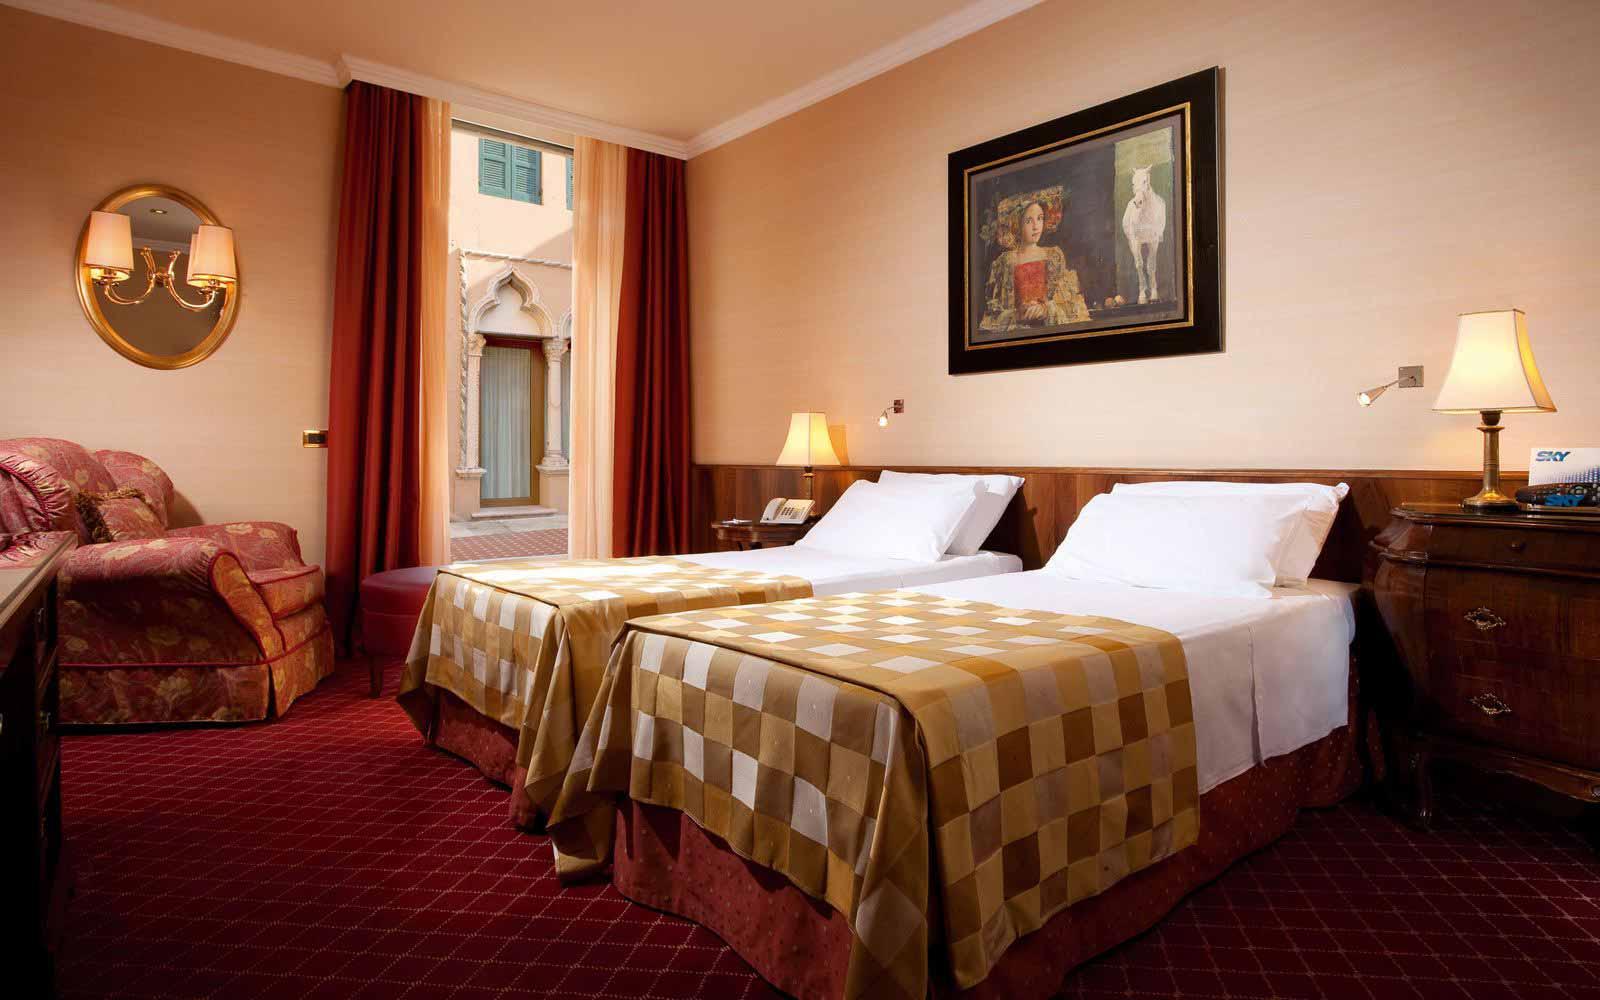 Hotel accademia verona cities italy sardatur holidays for Accademia verona